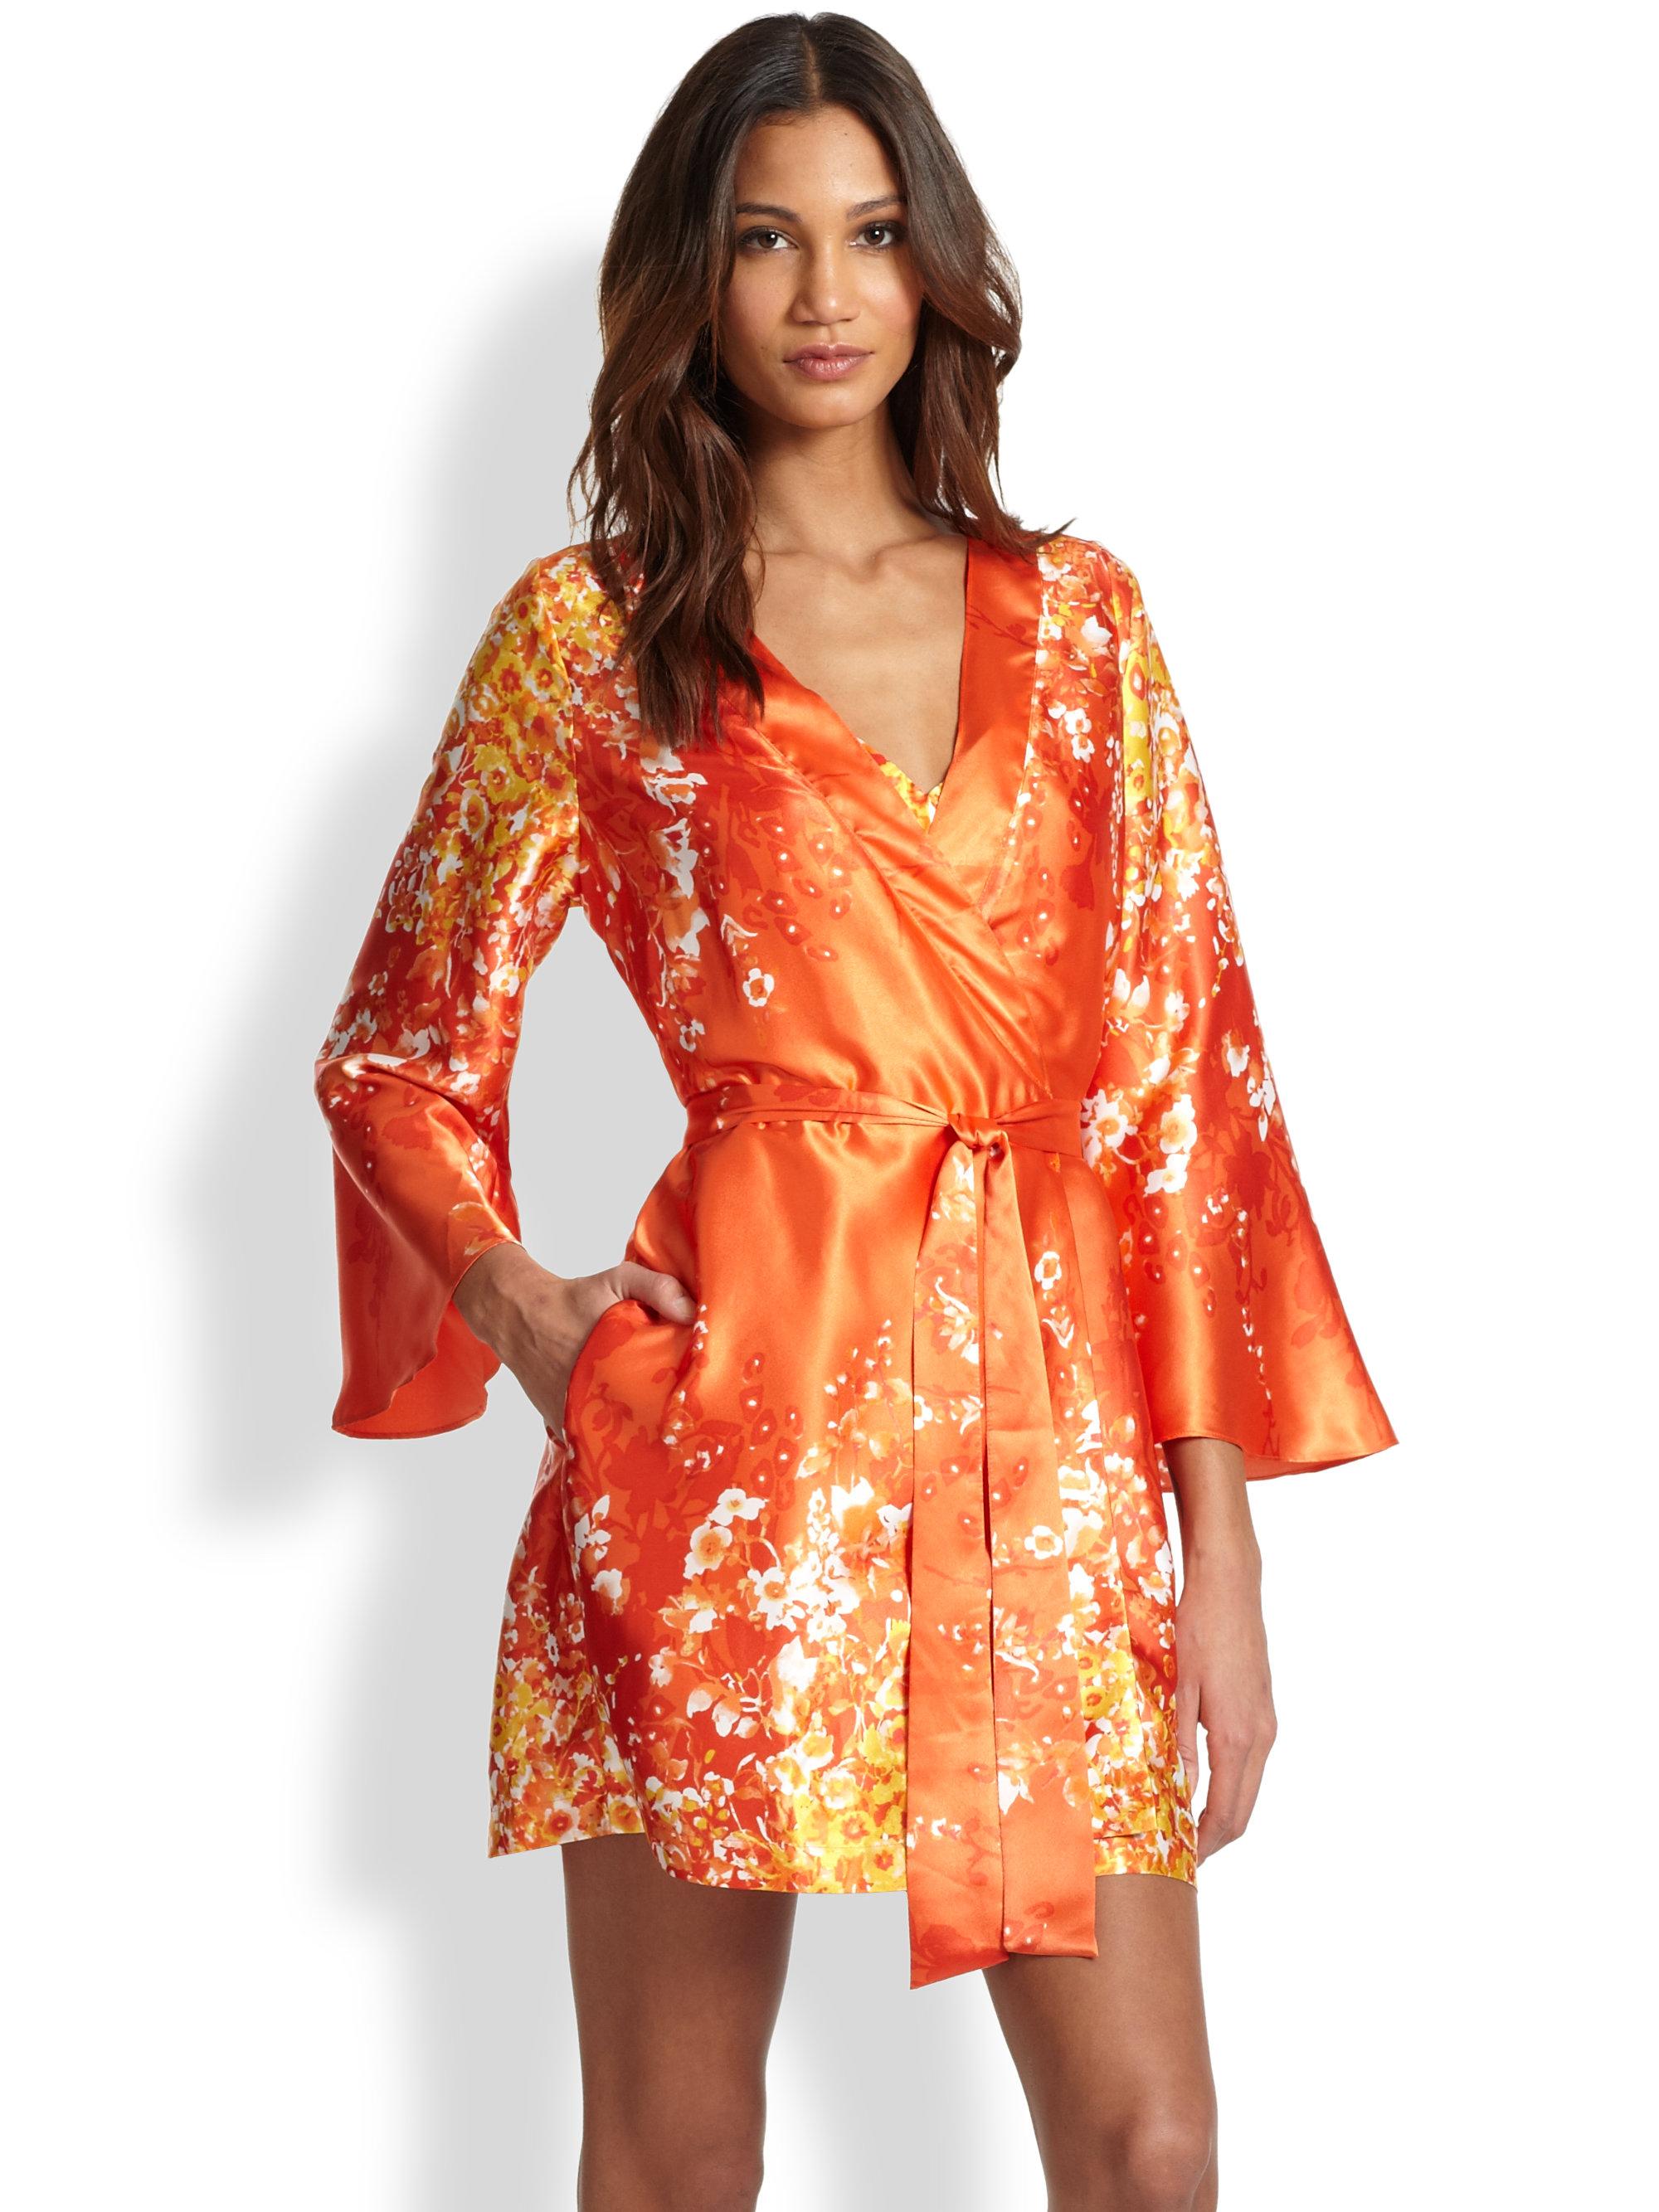 3812f87d31 Lyst - Oscar de la Renta Wildflower Satin Charmeuse Short Robe in Orange